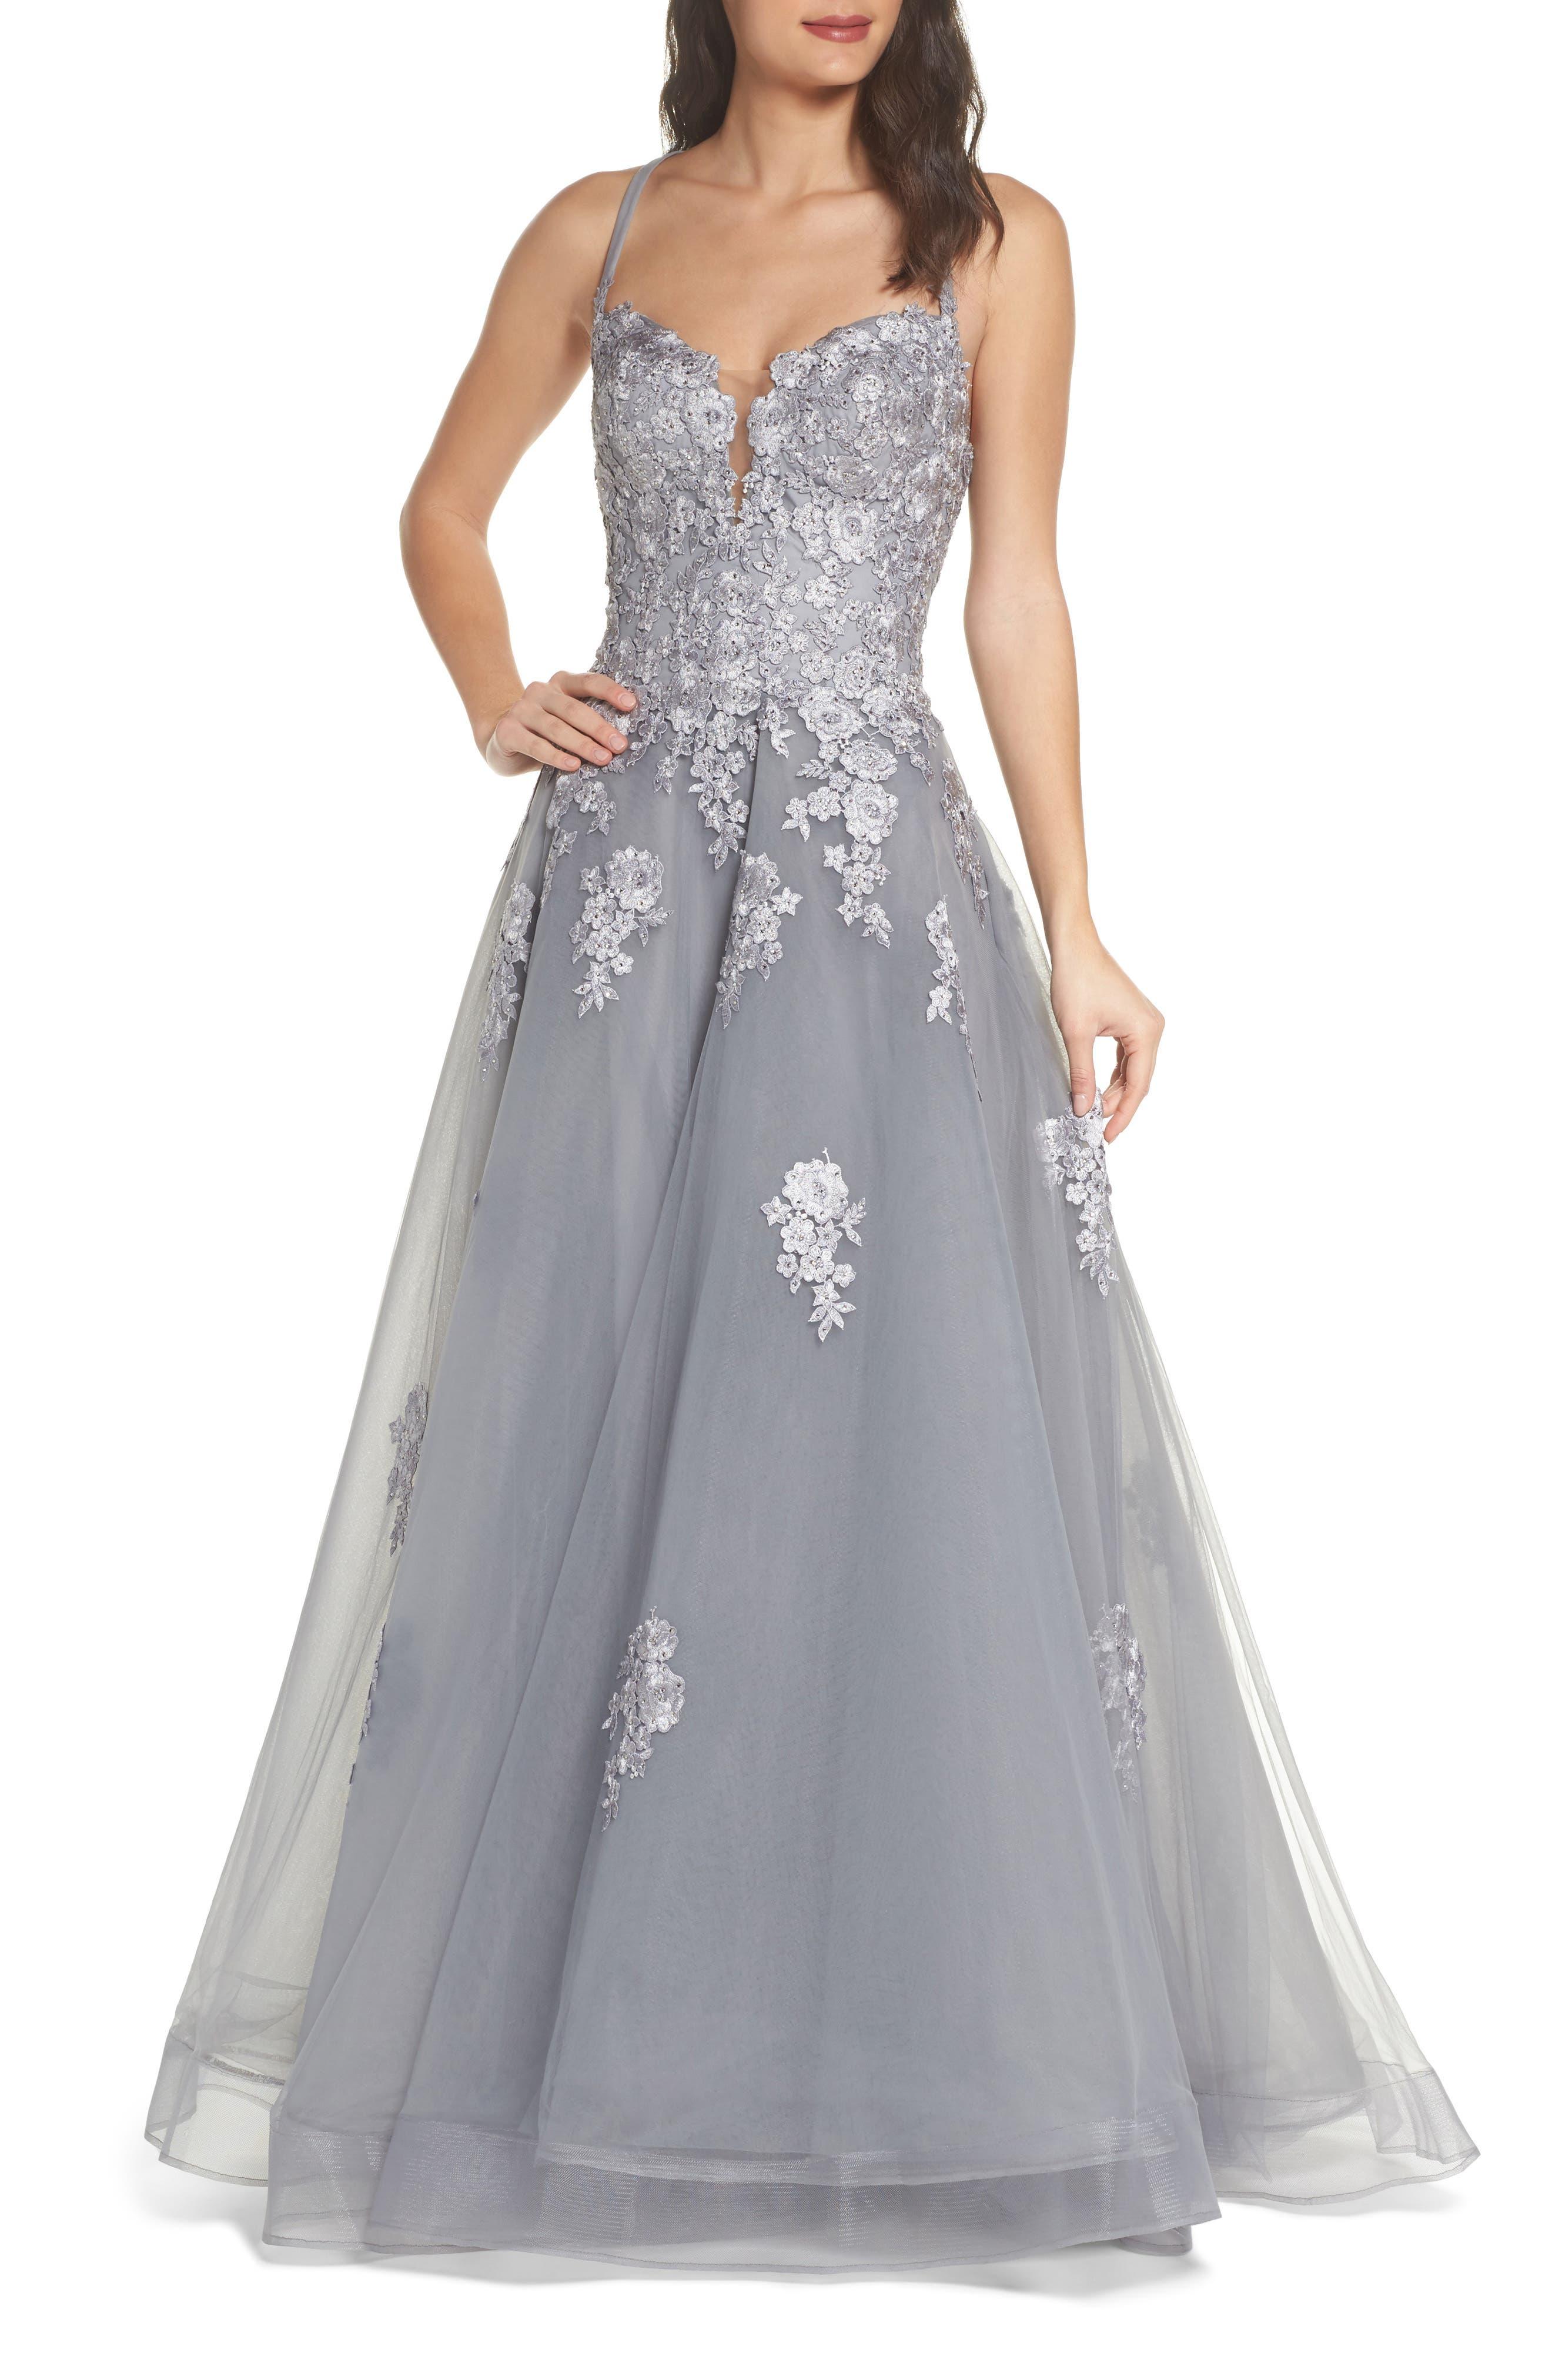 Grey 2018 Prom Dresses   Nordstrom